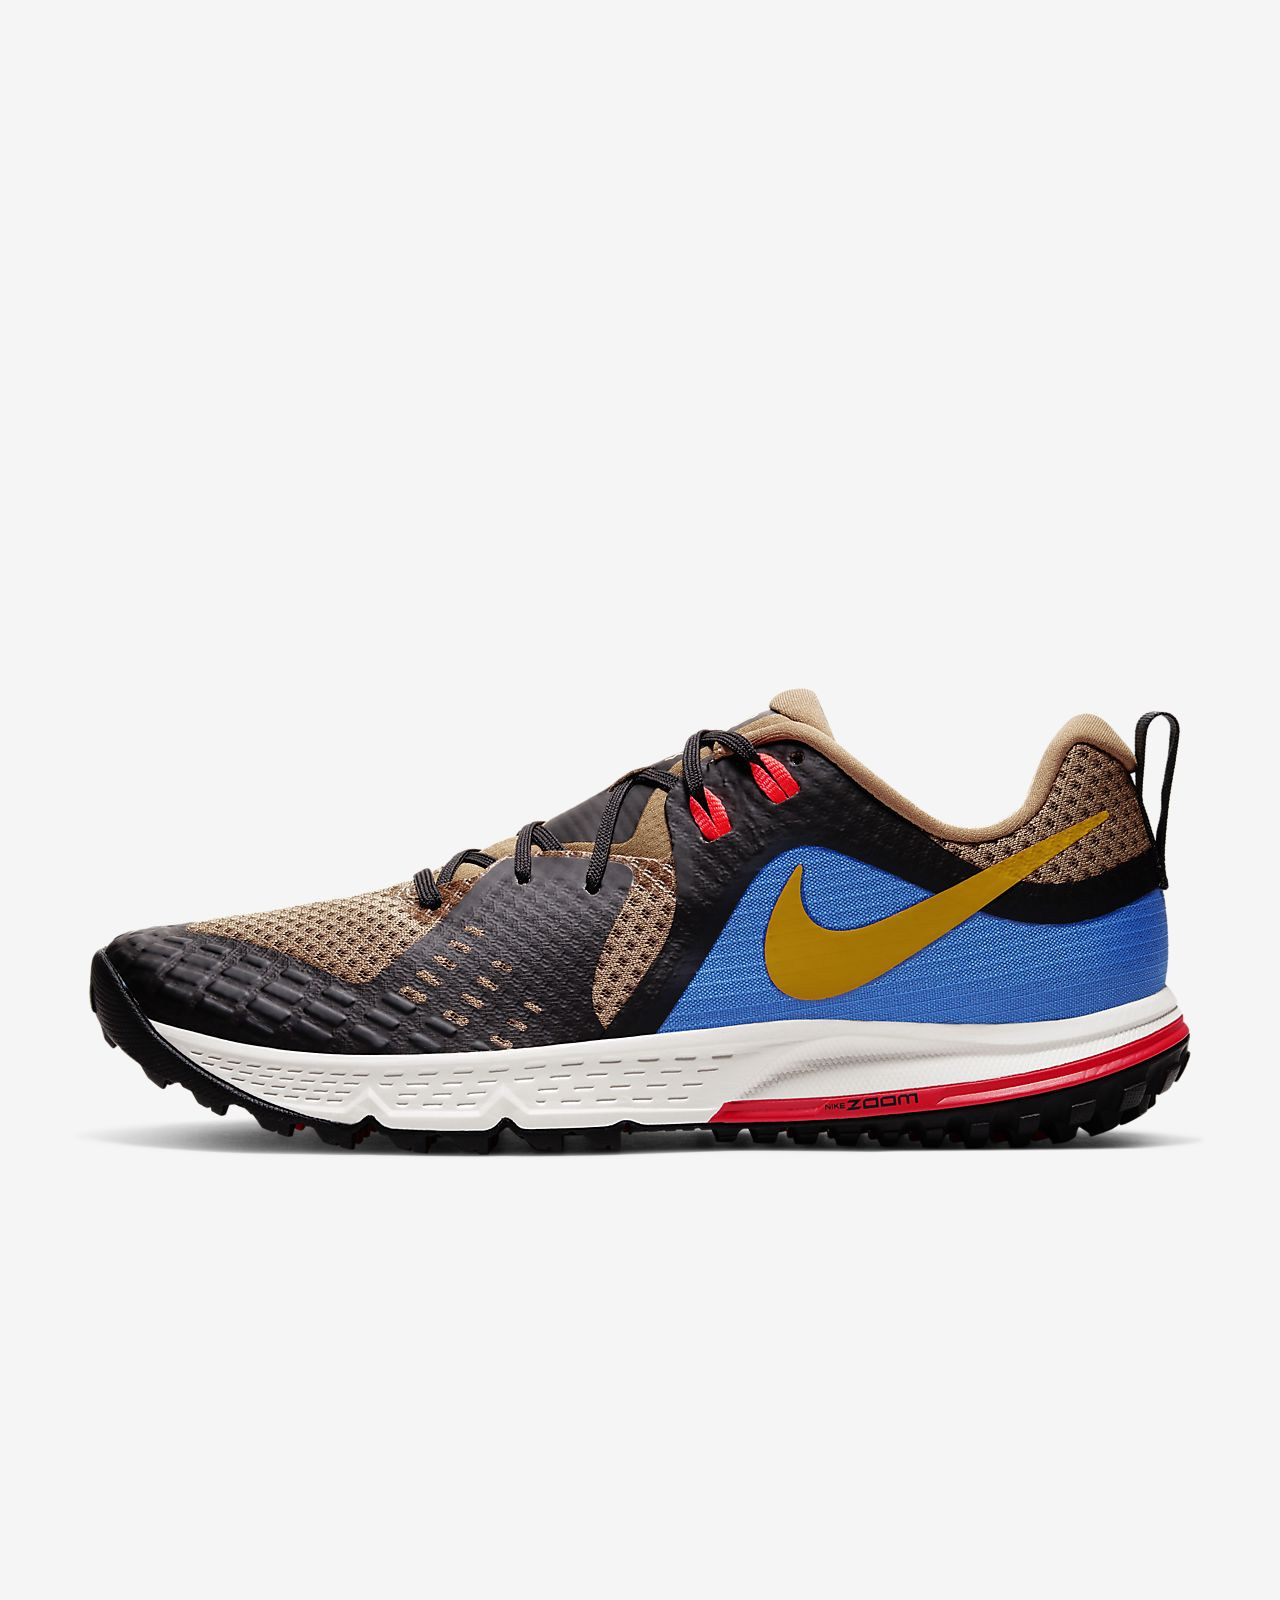 Nike Air Zoom Wildhorse 5 男款越野跑鞋